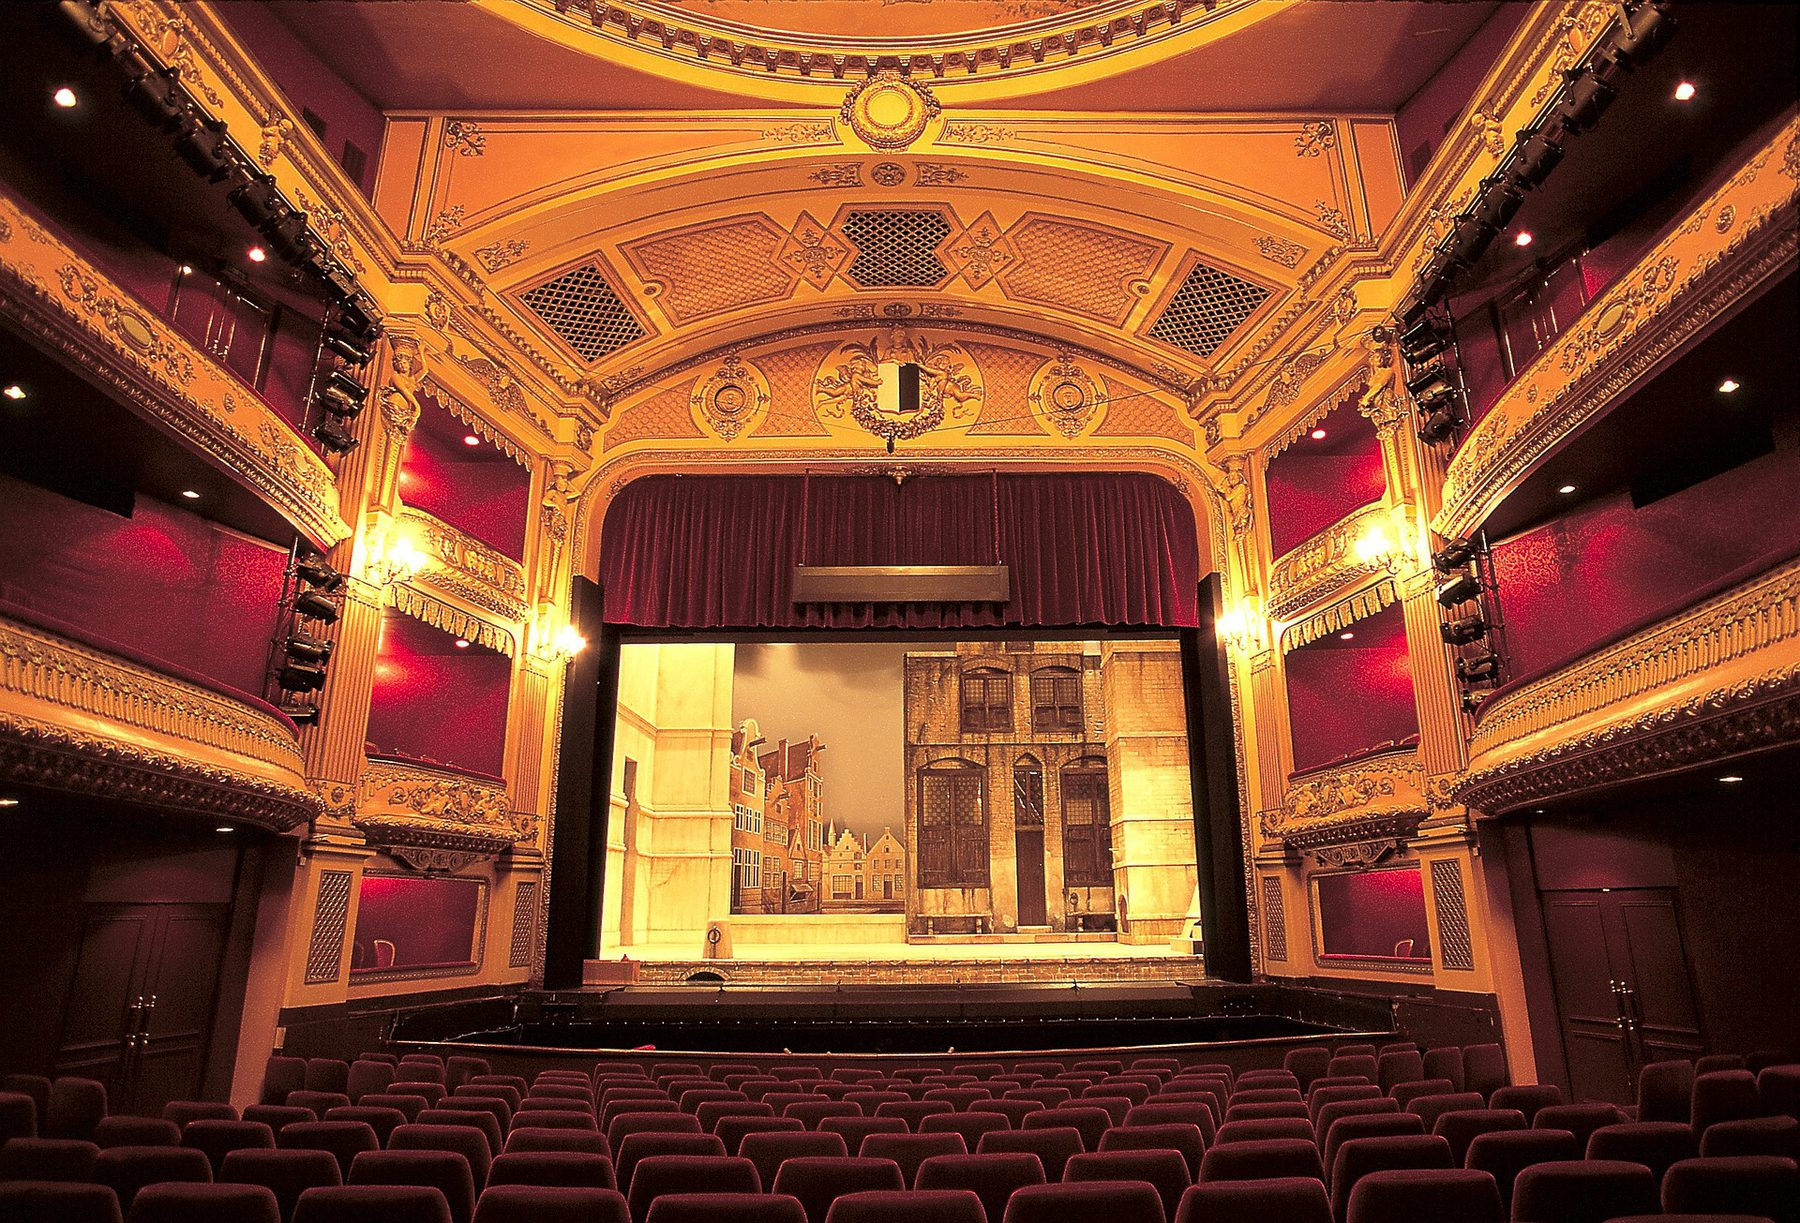 Music Visual and Performing Arts (Sector Header: Theatre Auditorium)